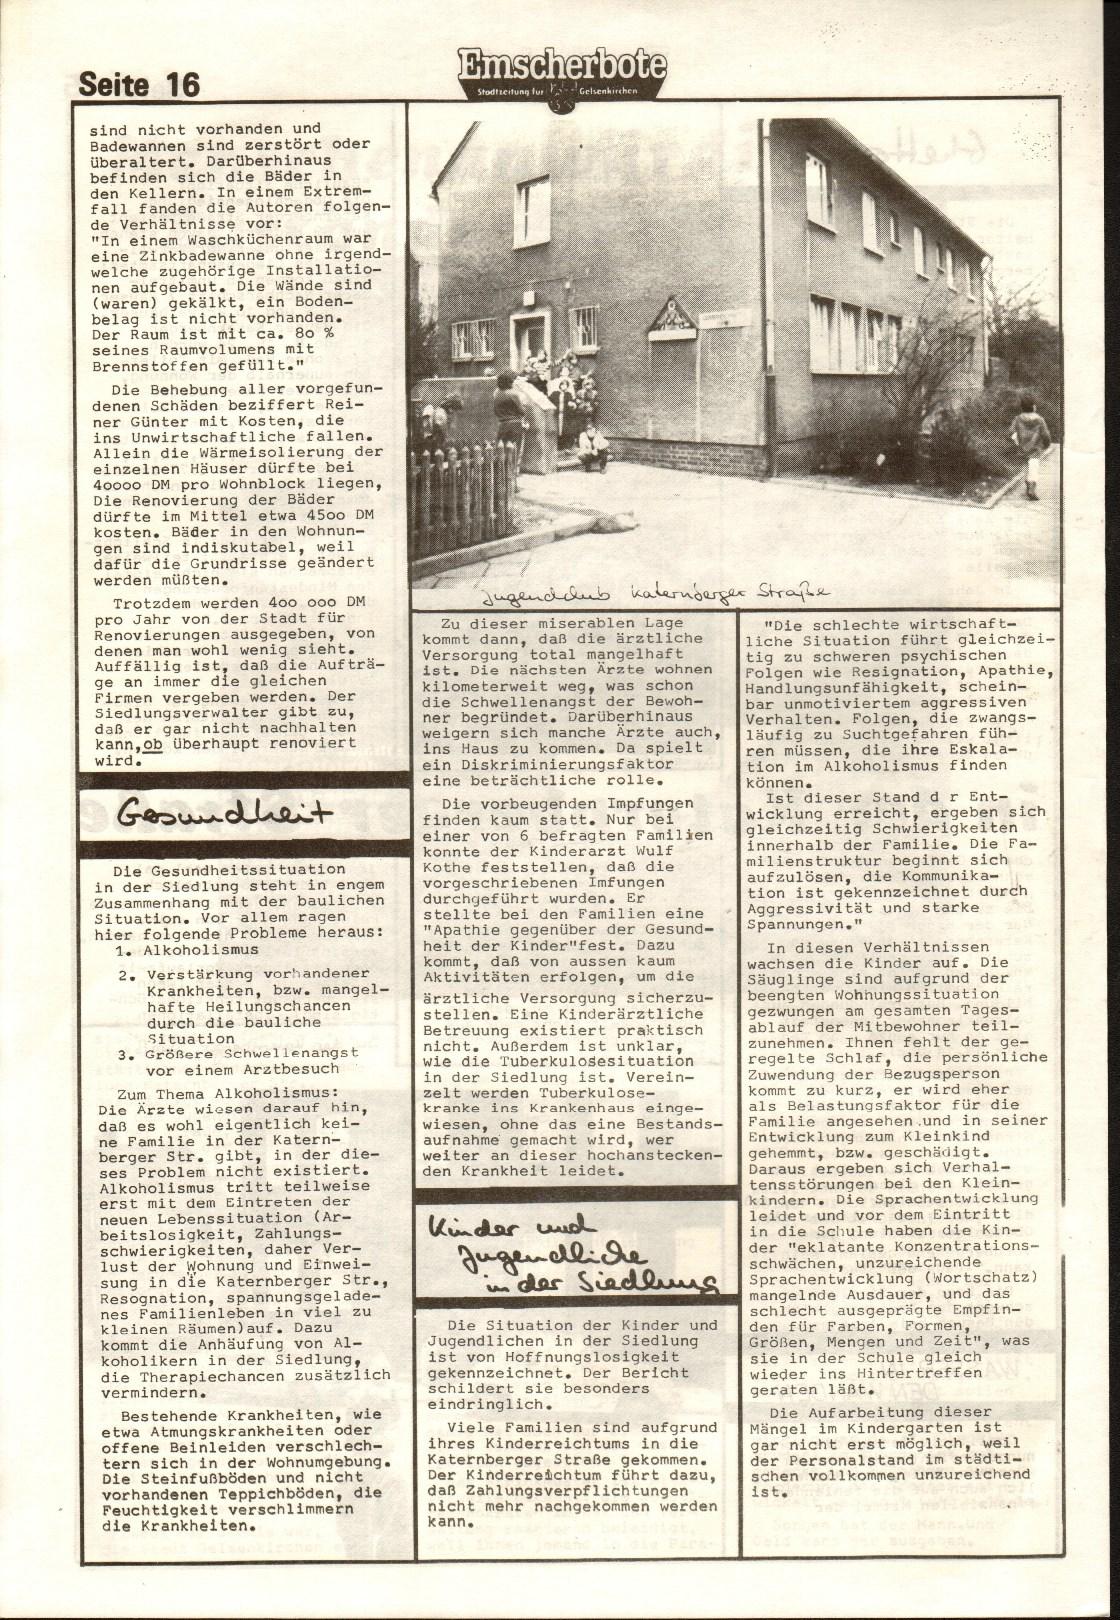 Gelsenkirchen_Emscherbote_1982_22_16